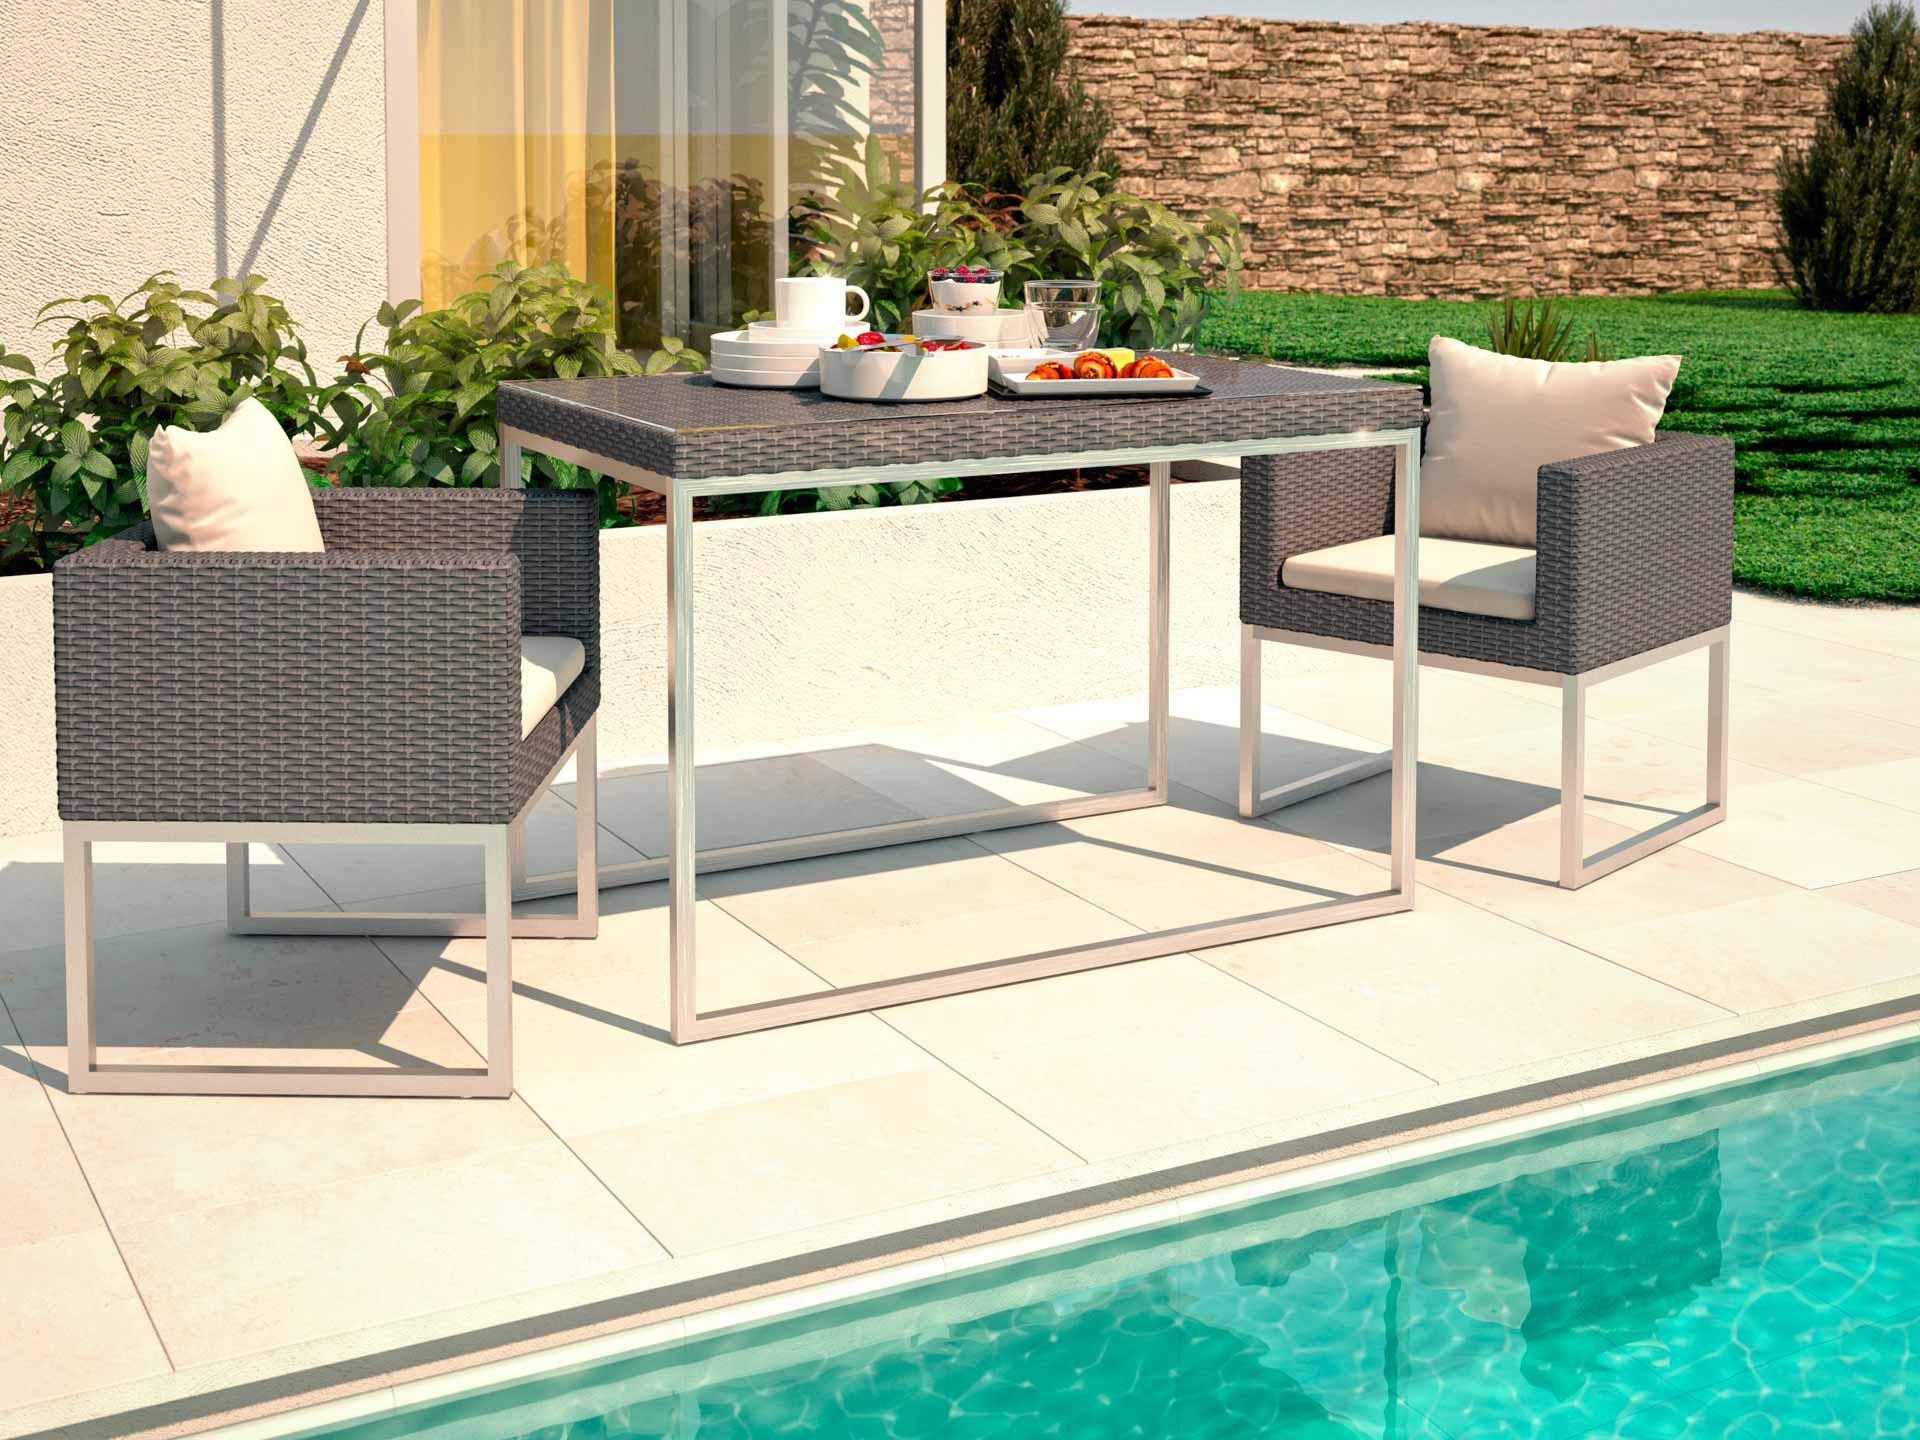 artelia polyrattan aluminium esstisch set mara s. Black Bedroom Furniture Sets. Home Design Ideas